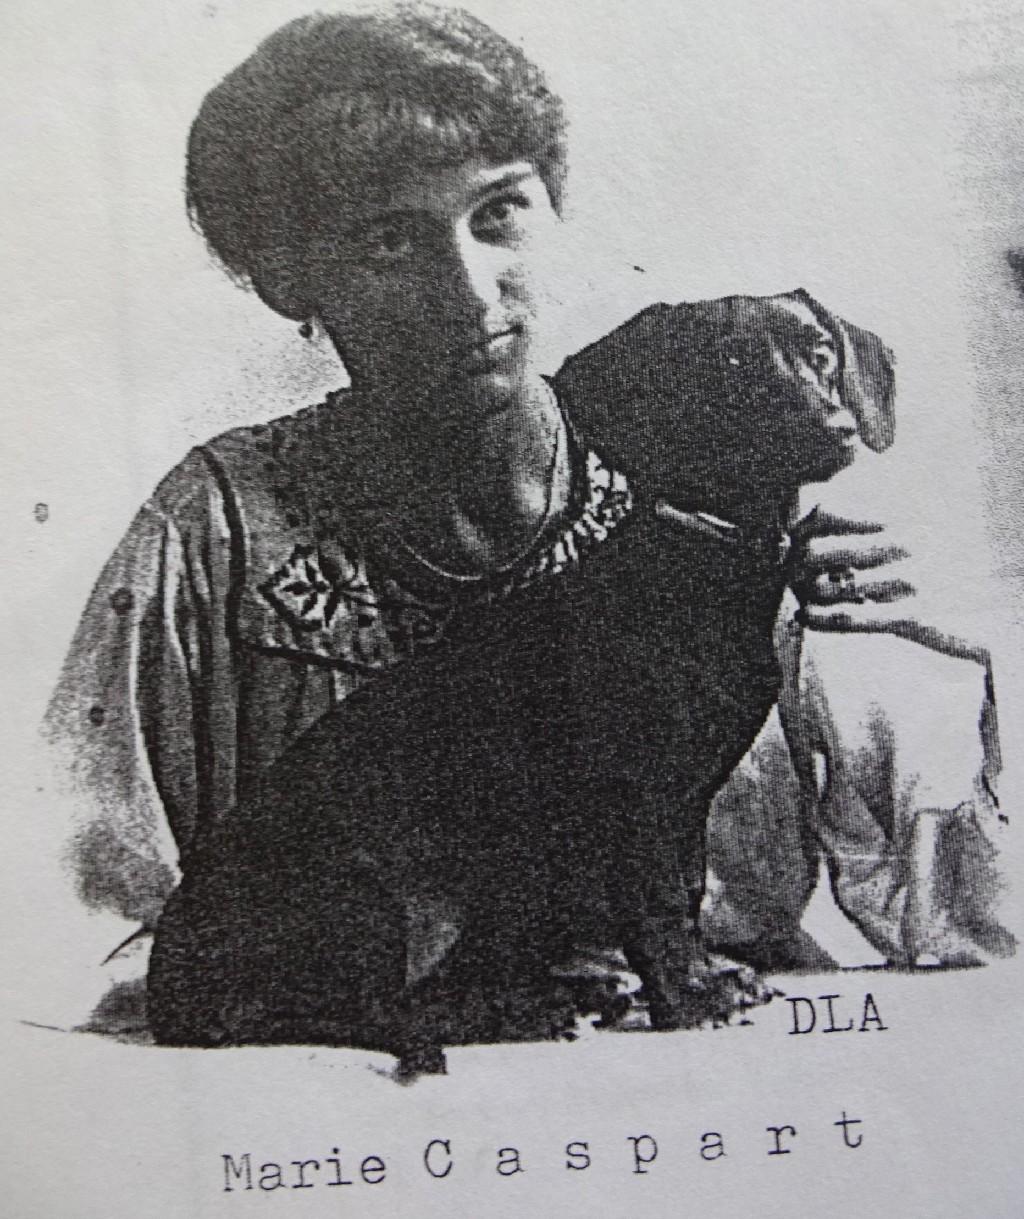 Marie Caspart